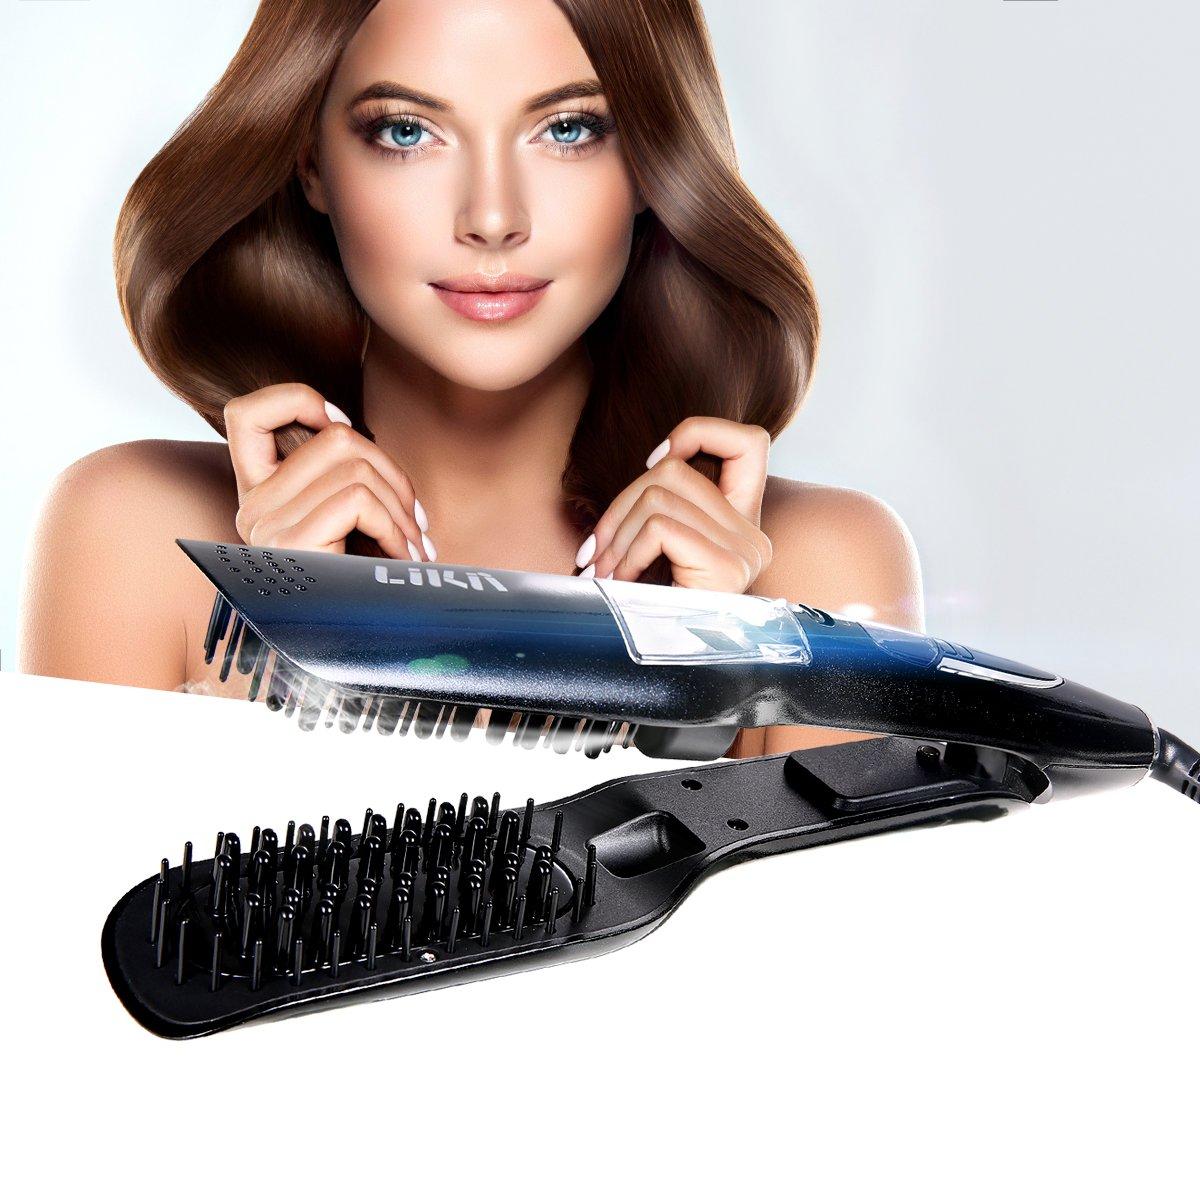 Plancha de pelo, Alisador de pelo, Likii, Cepillo vapor alisador, Peine con pantalla LCD, Alisador de pelo profesional, guantes de regalo.